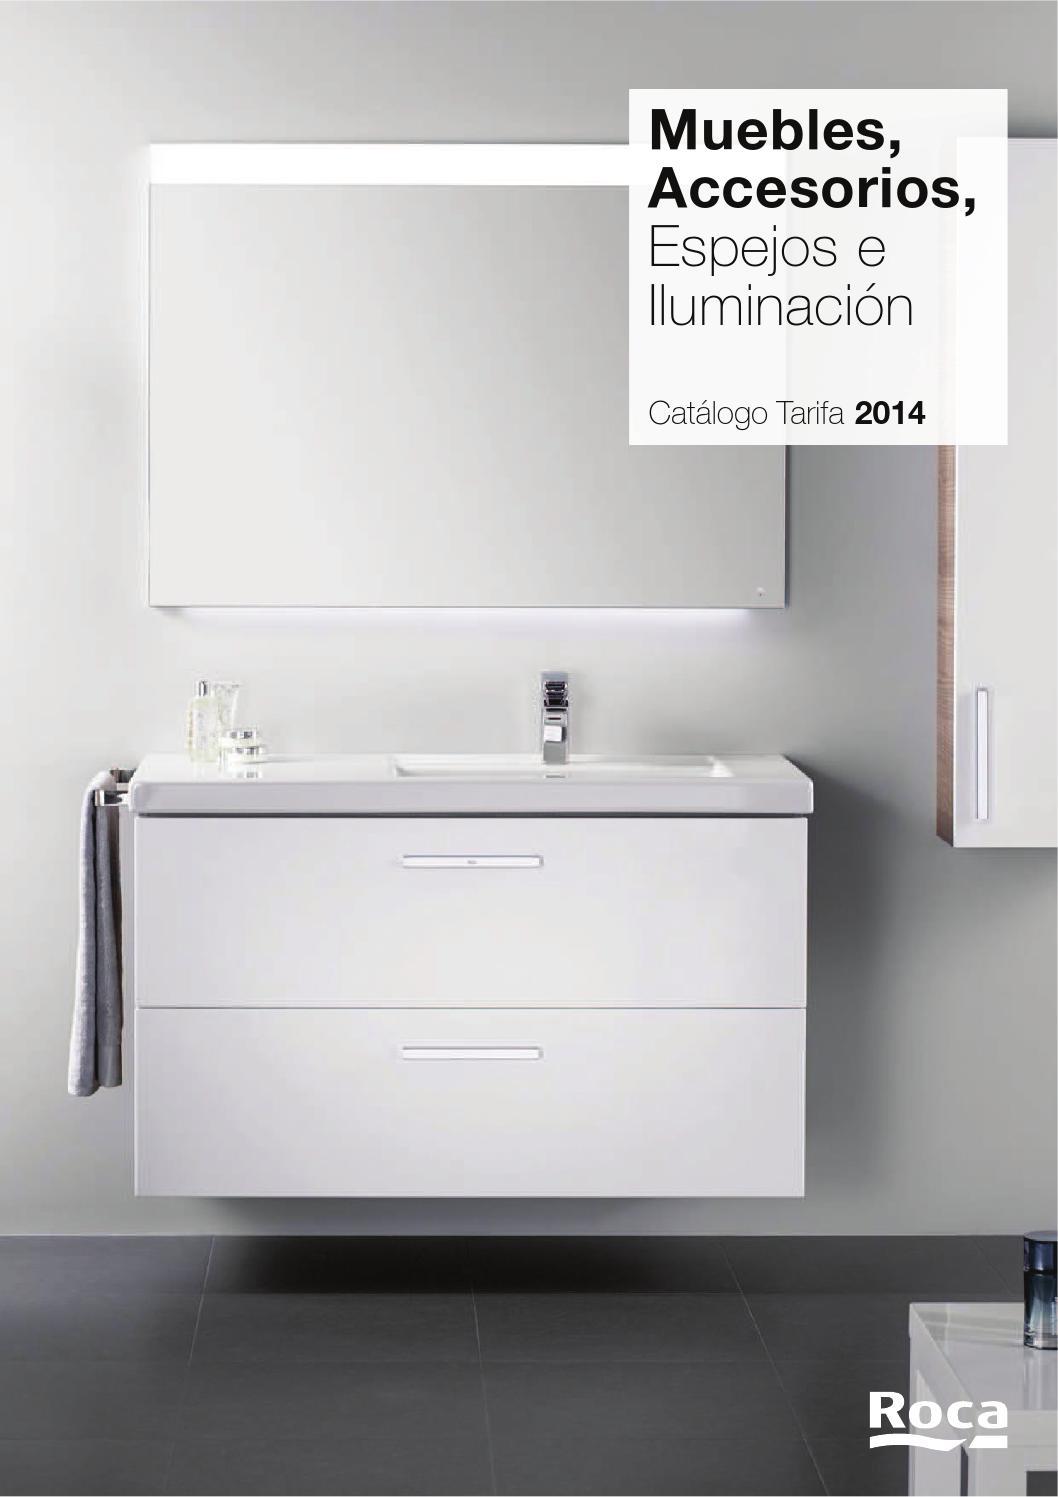 Cat logo muebles roca 2014 by servidaya issuu for Catalogo griferia roca